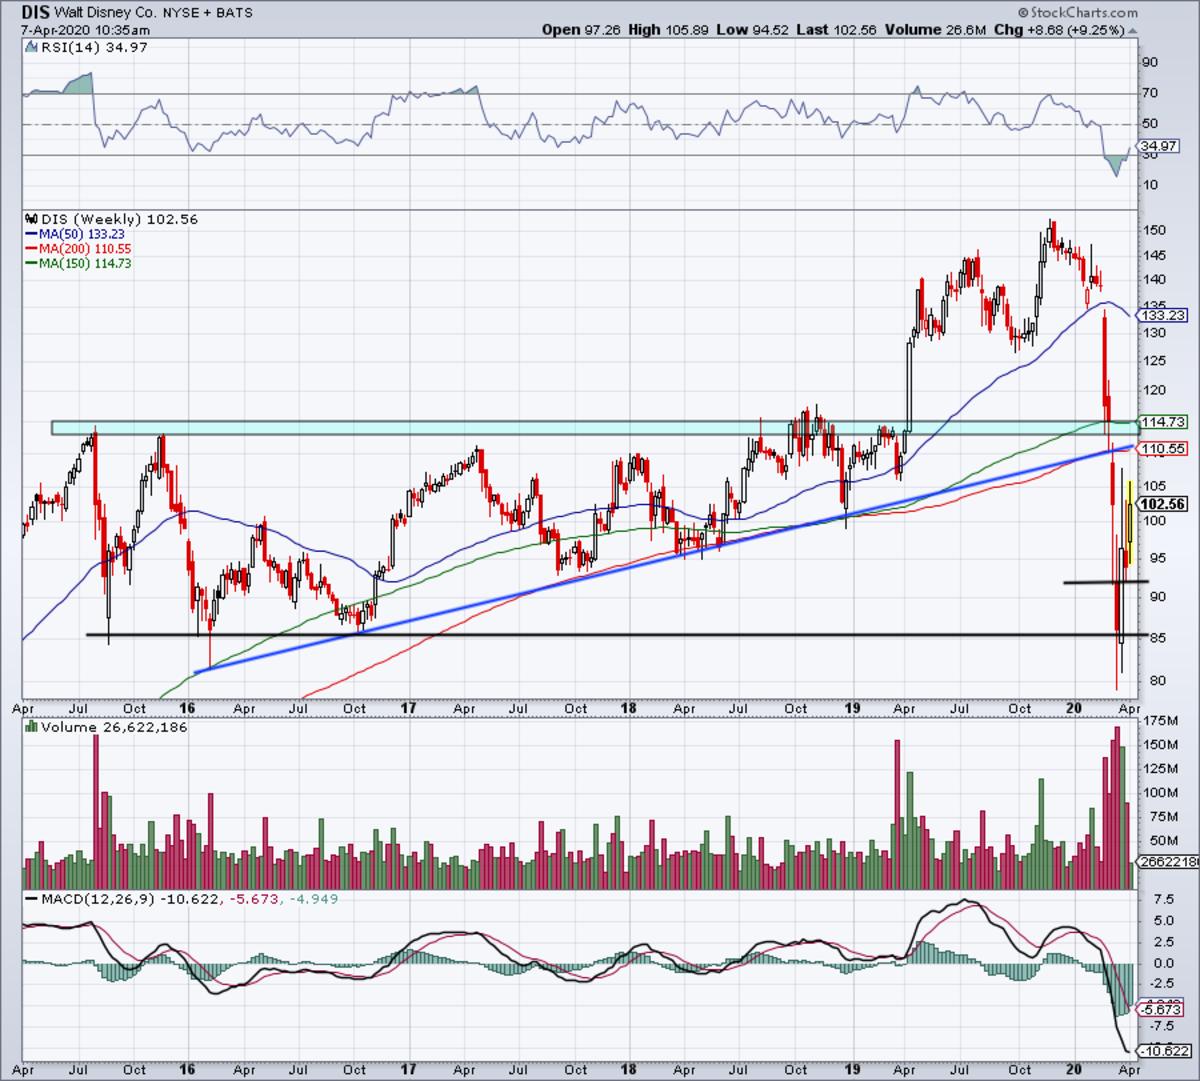 Weekly chart of Disney stock.